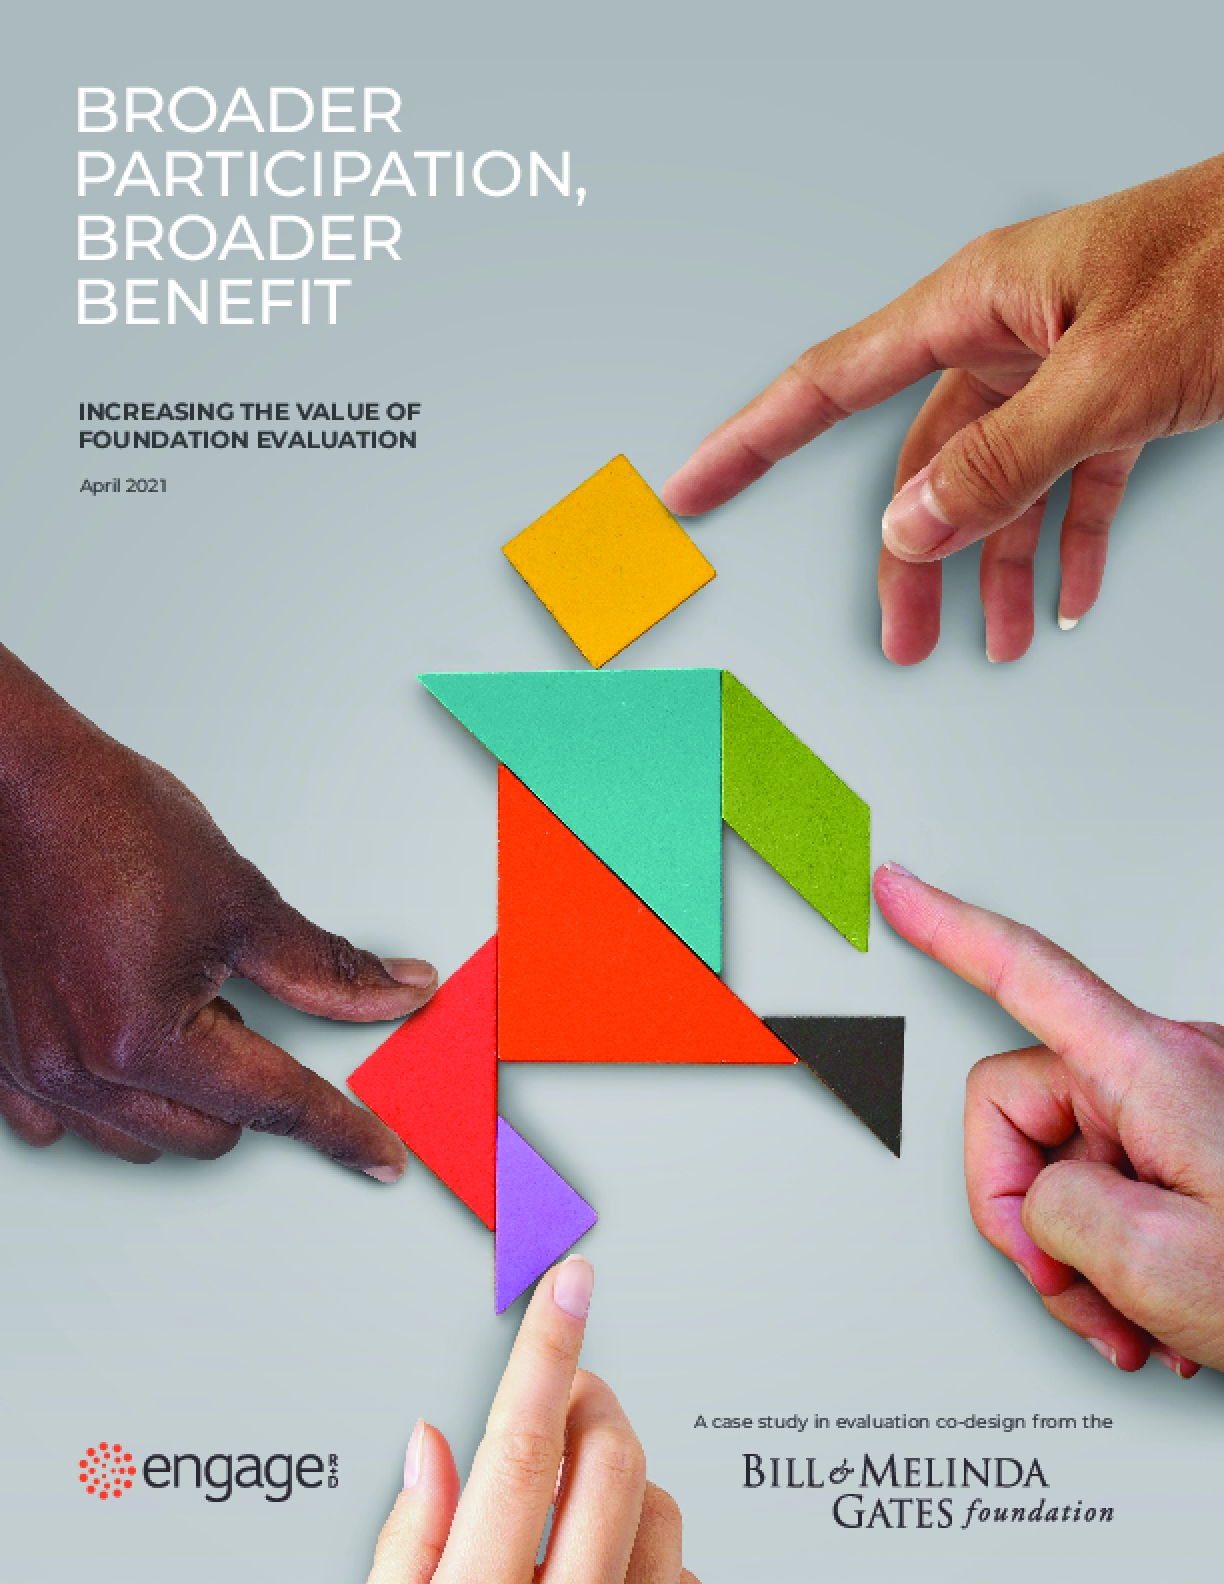 Broader Participation, Broader Benefit: Increasing the Value of Foundation Evaluation